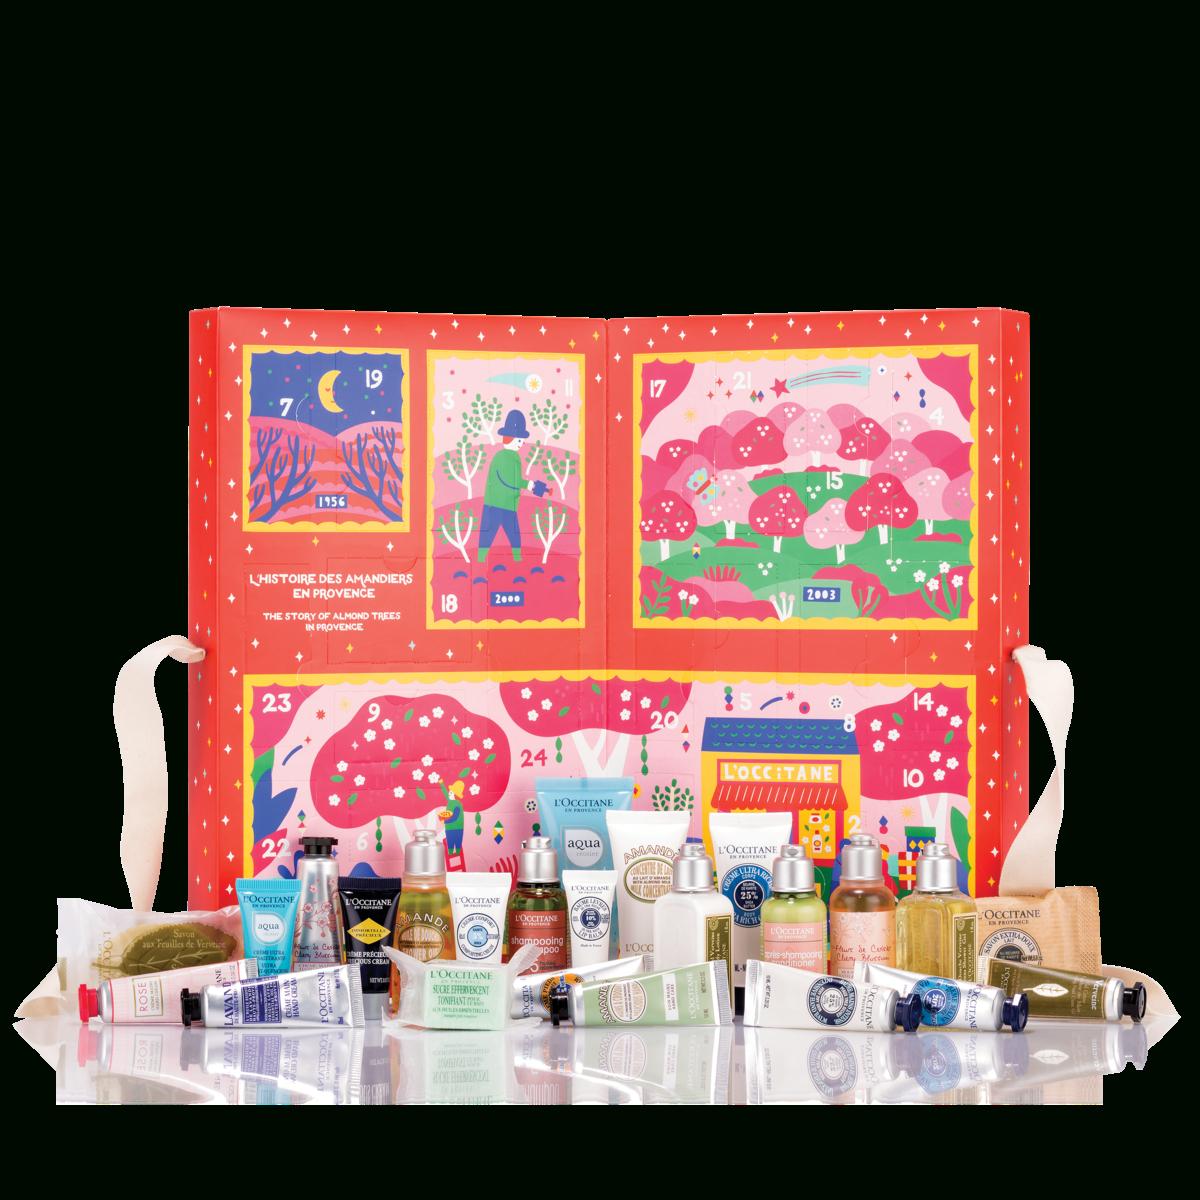 Signature Advent Calendar | 24 Days Of Gifting | L'occitane